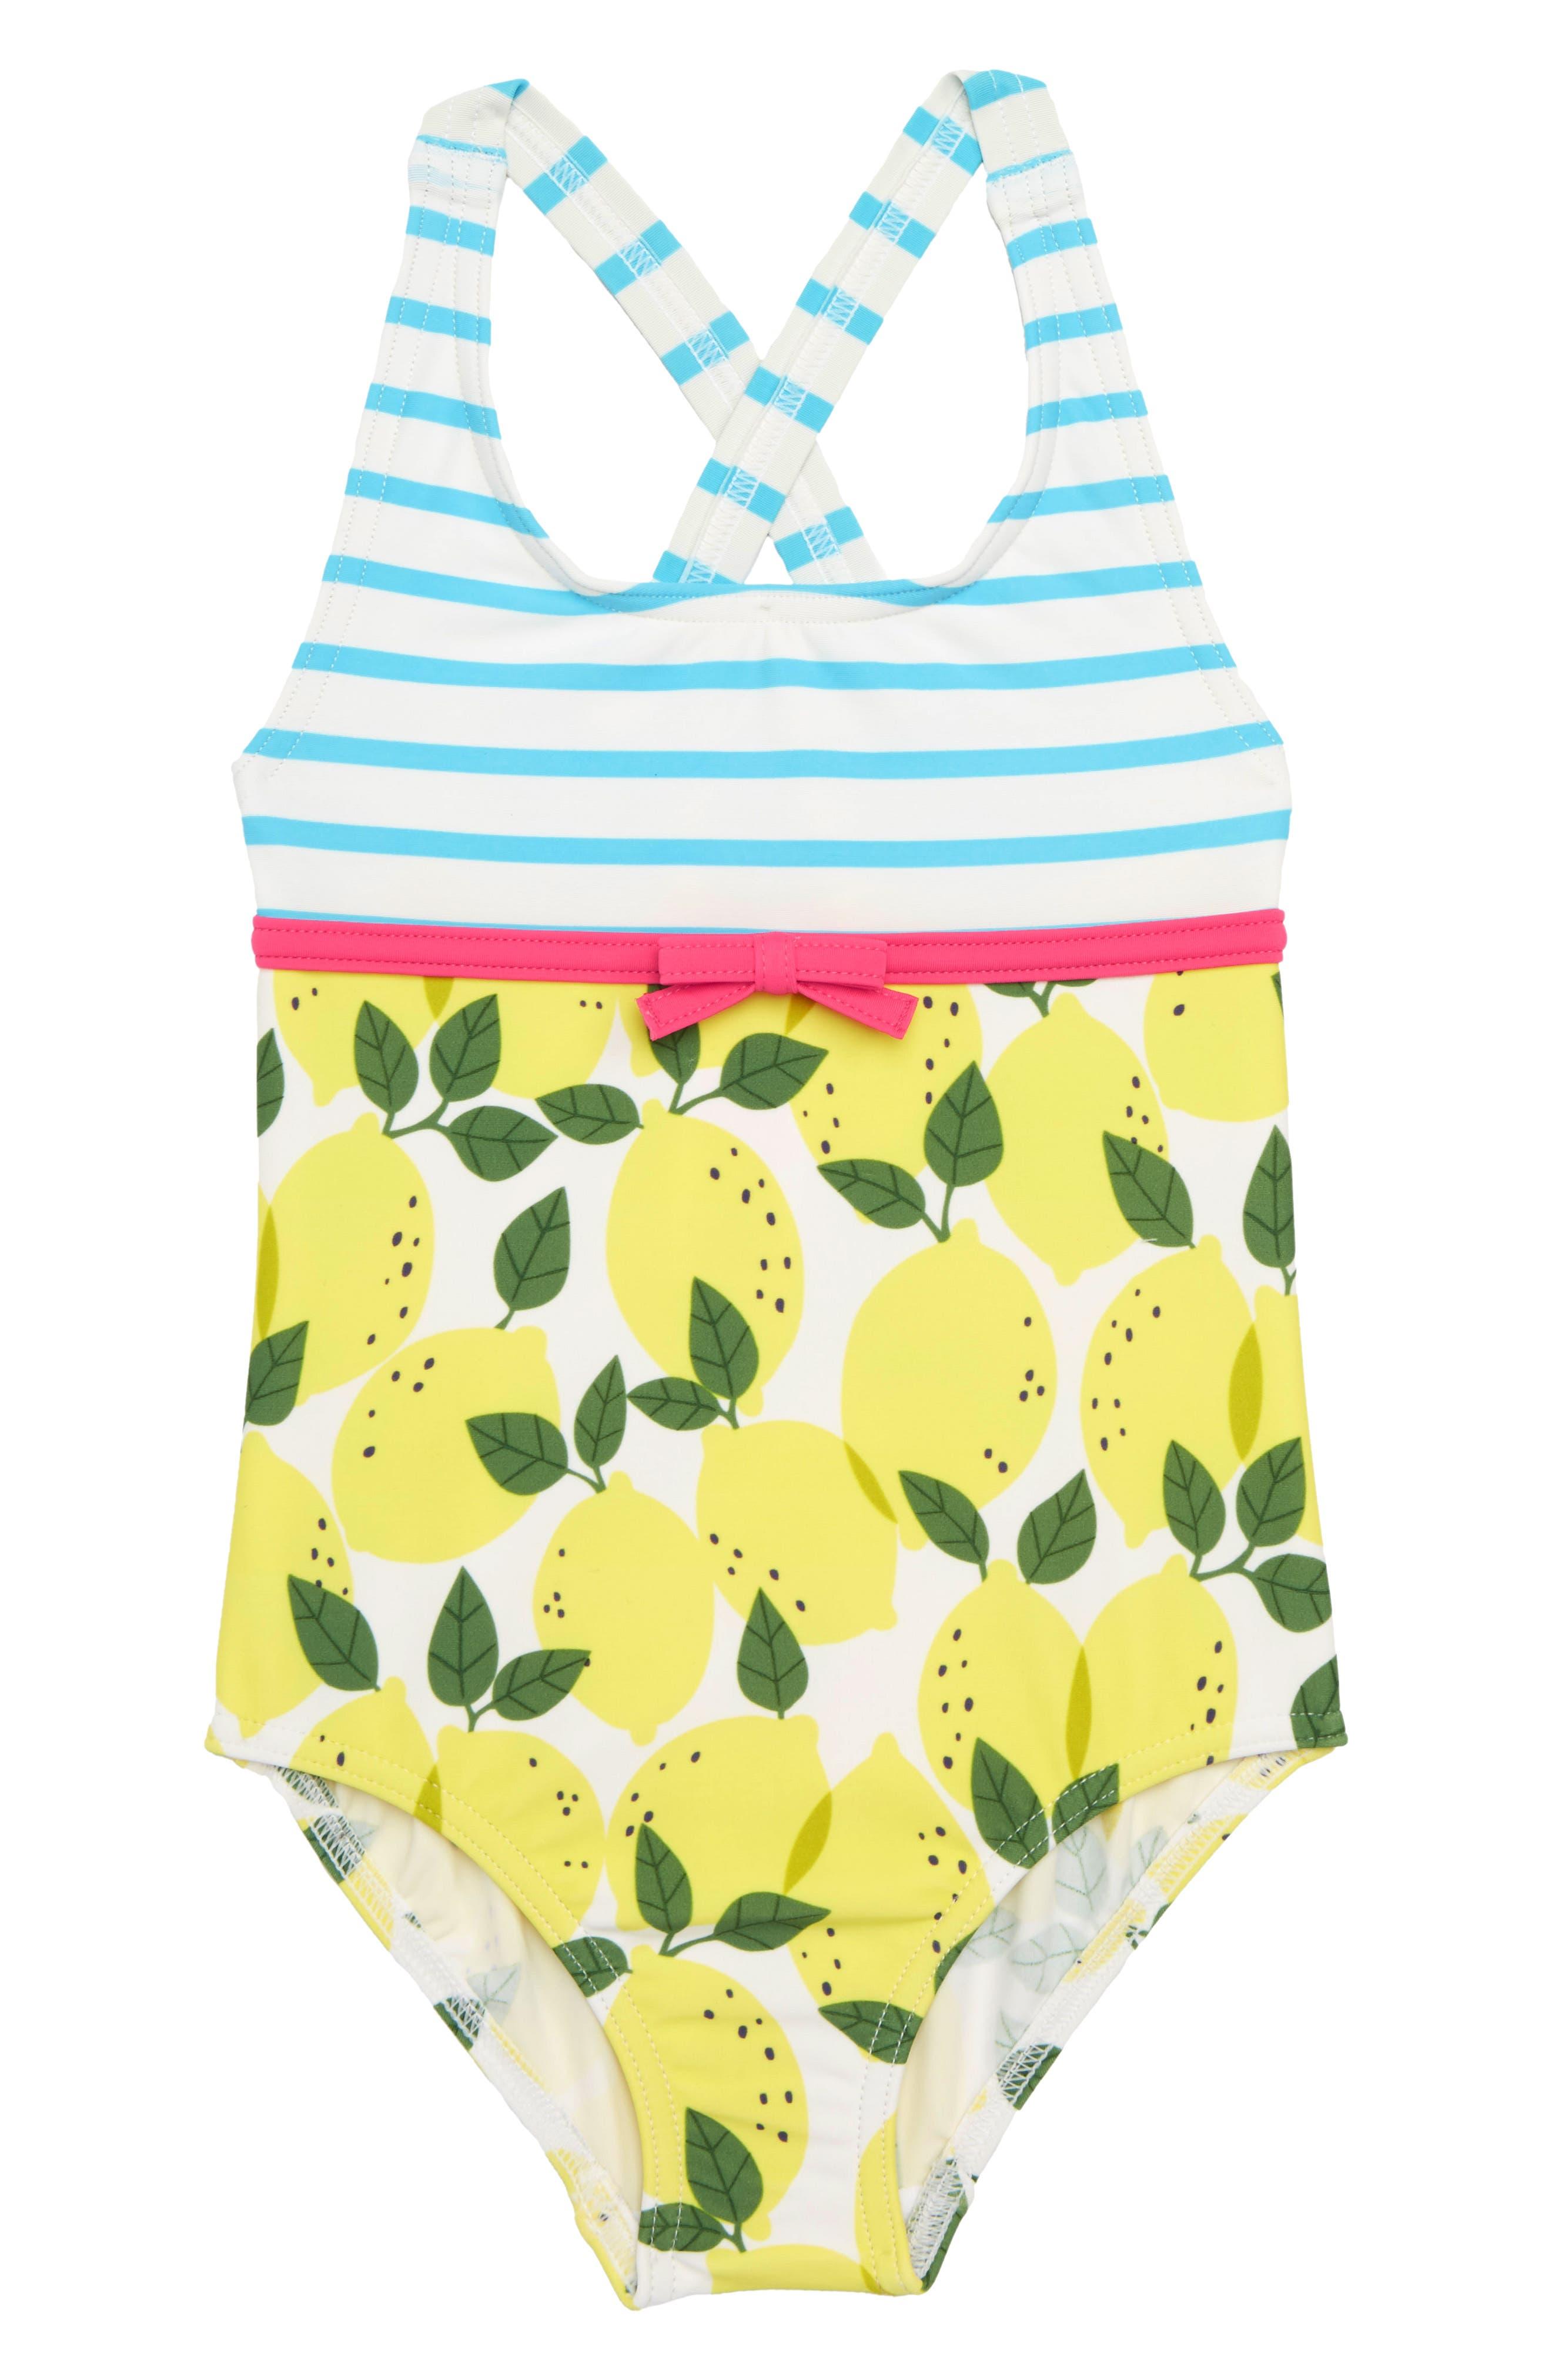 Hotchpotch One-Piece Swimsuit,                         Main,                         color, Ivory Lemon Tree Yel